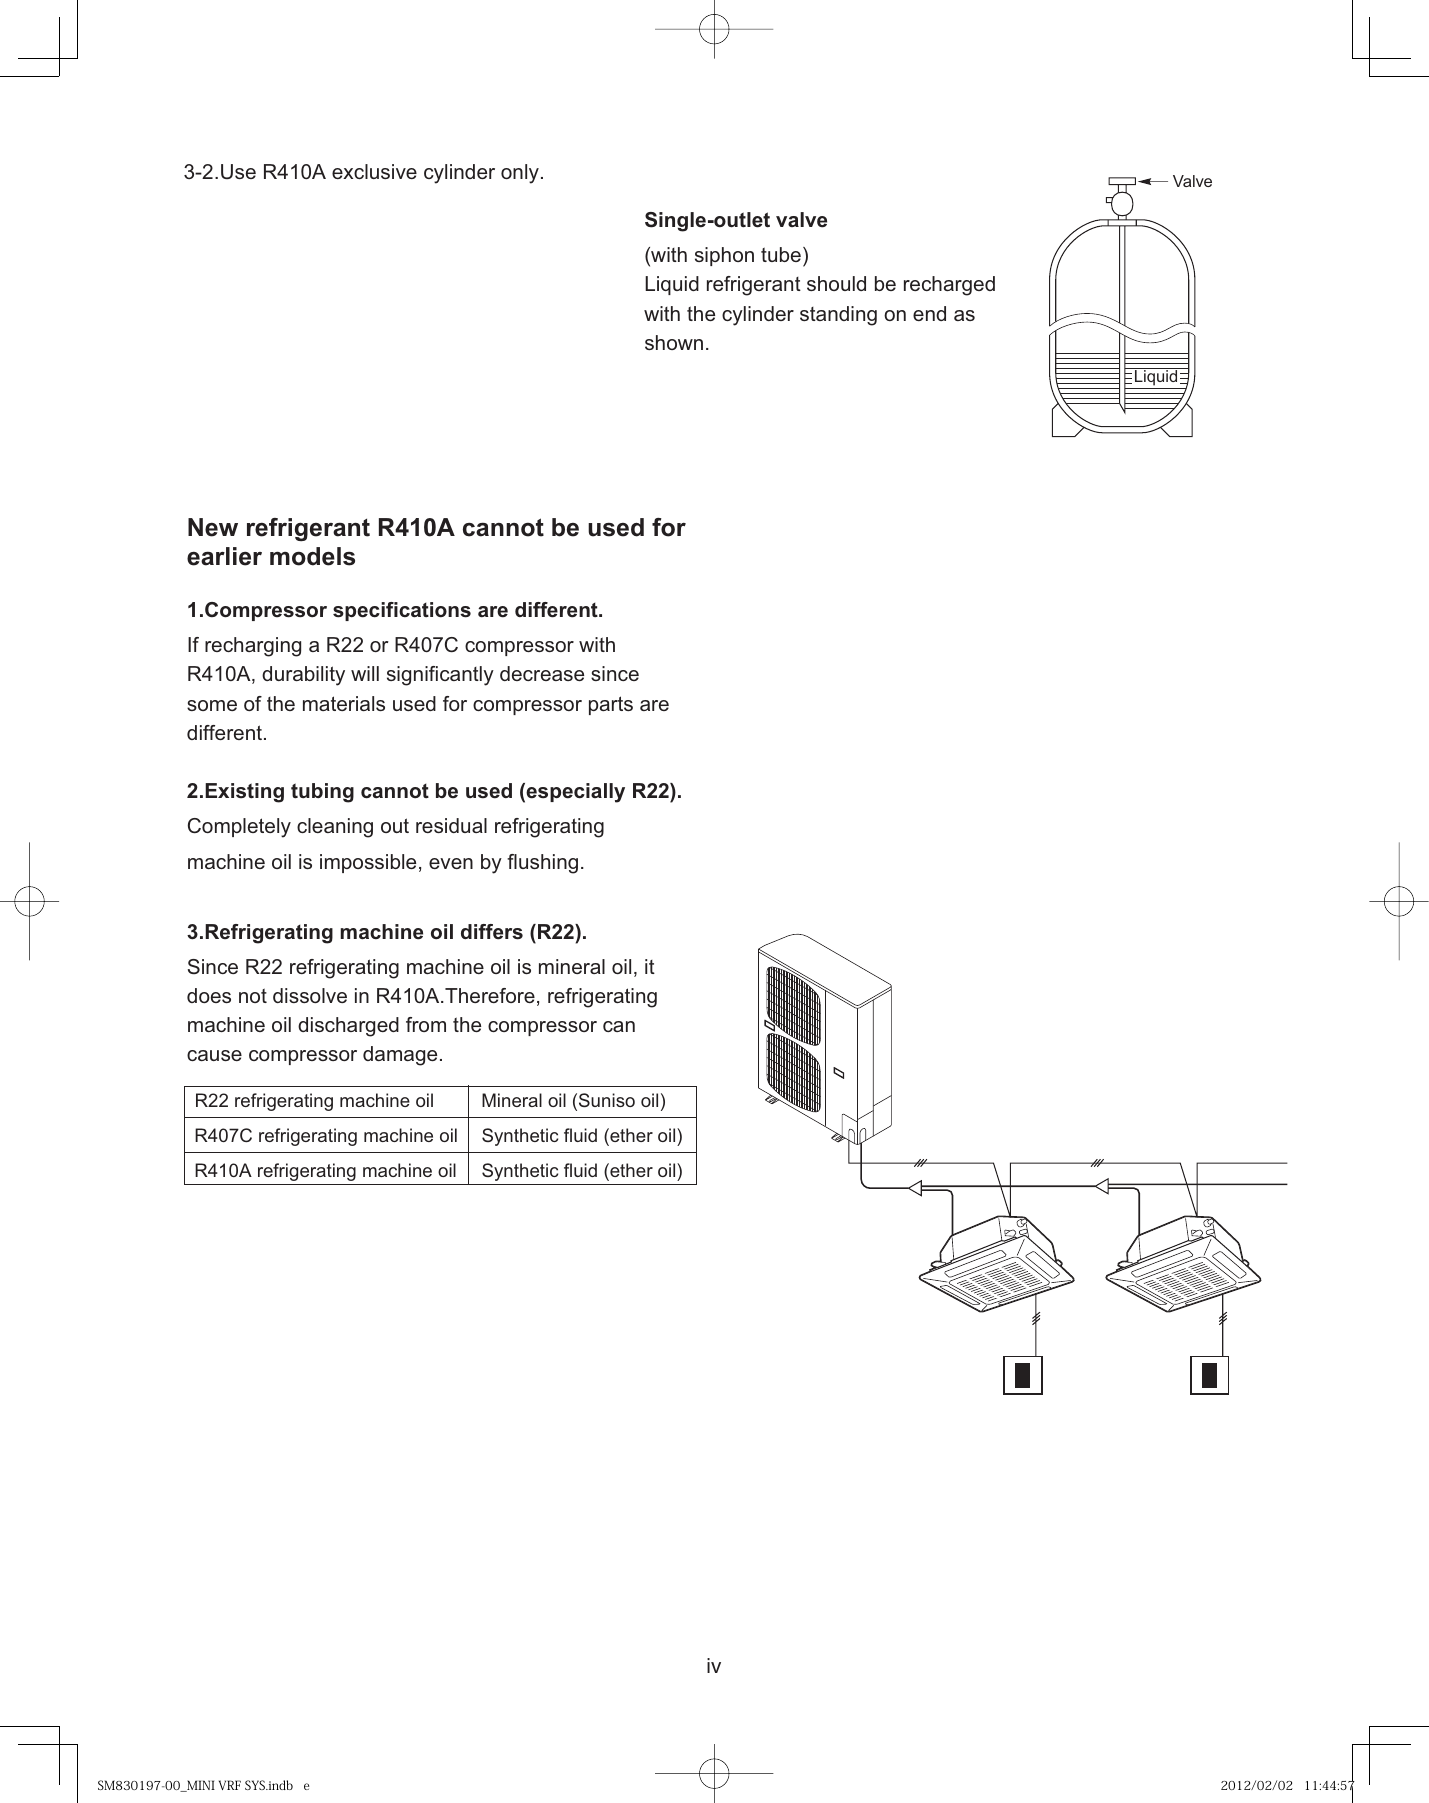 Panasonic Mini Eco I Service Manual SM830197 00_MINI VRF SYS indb